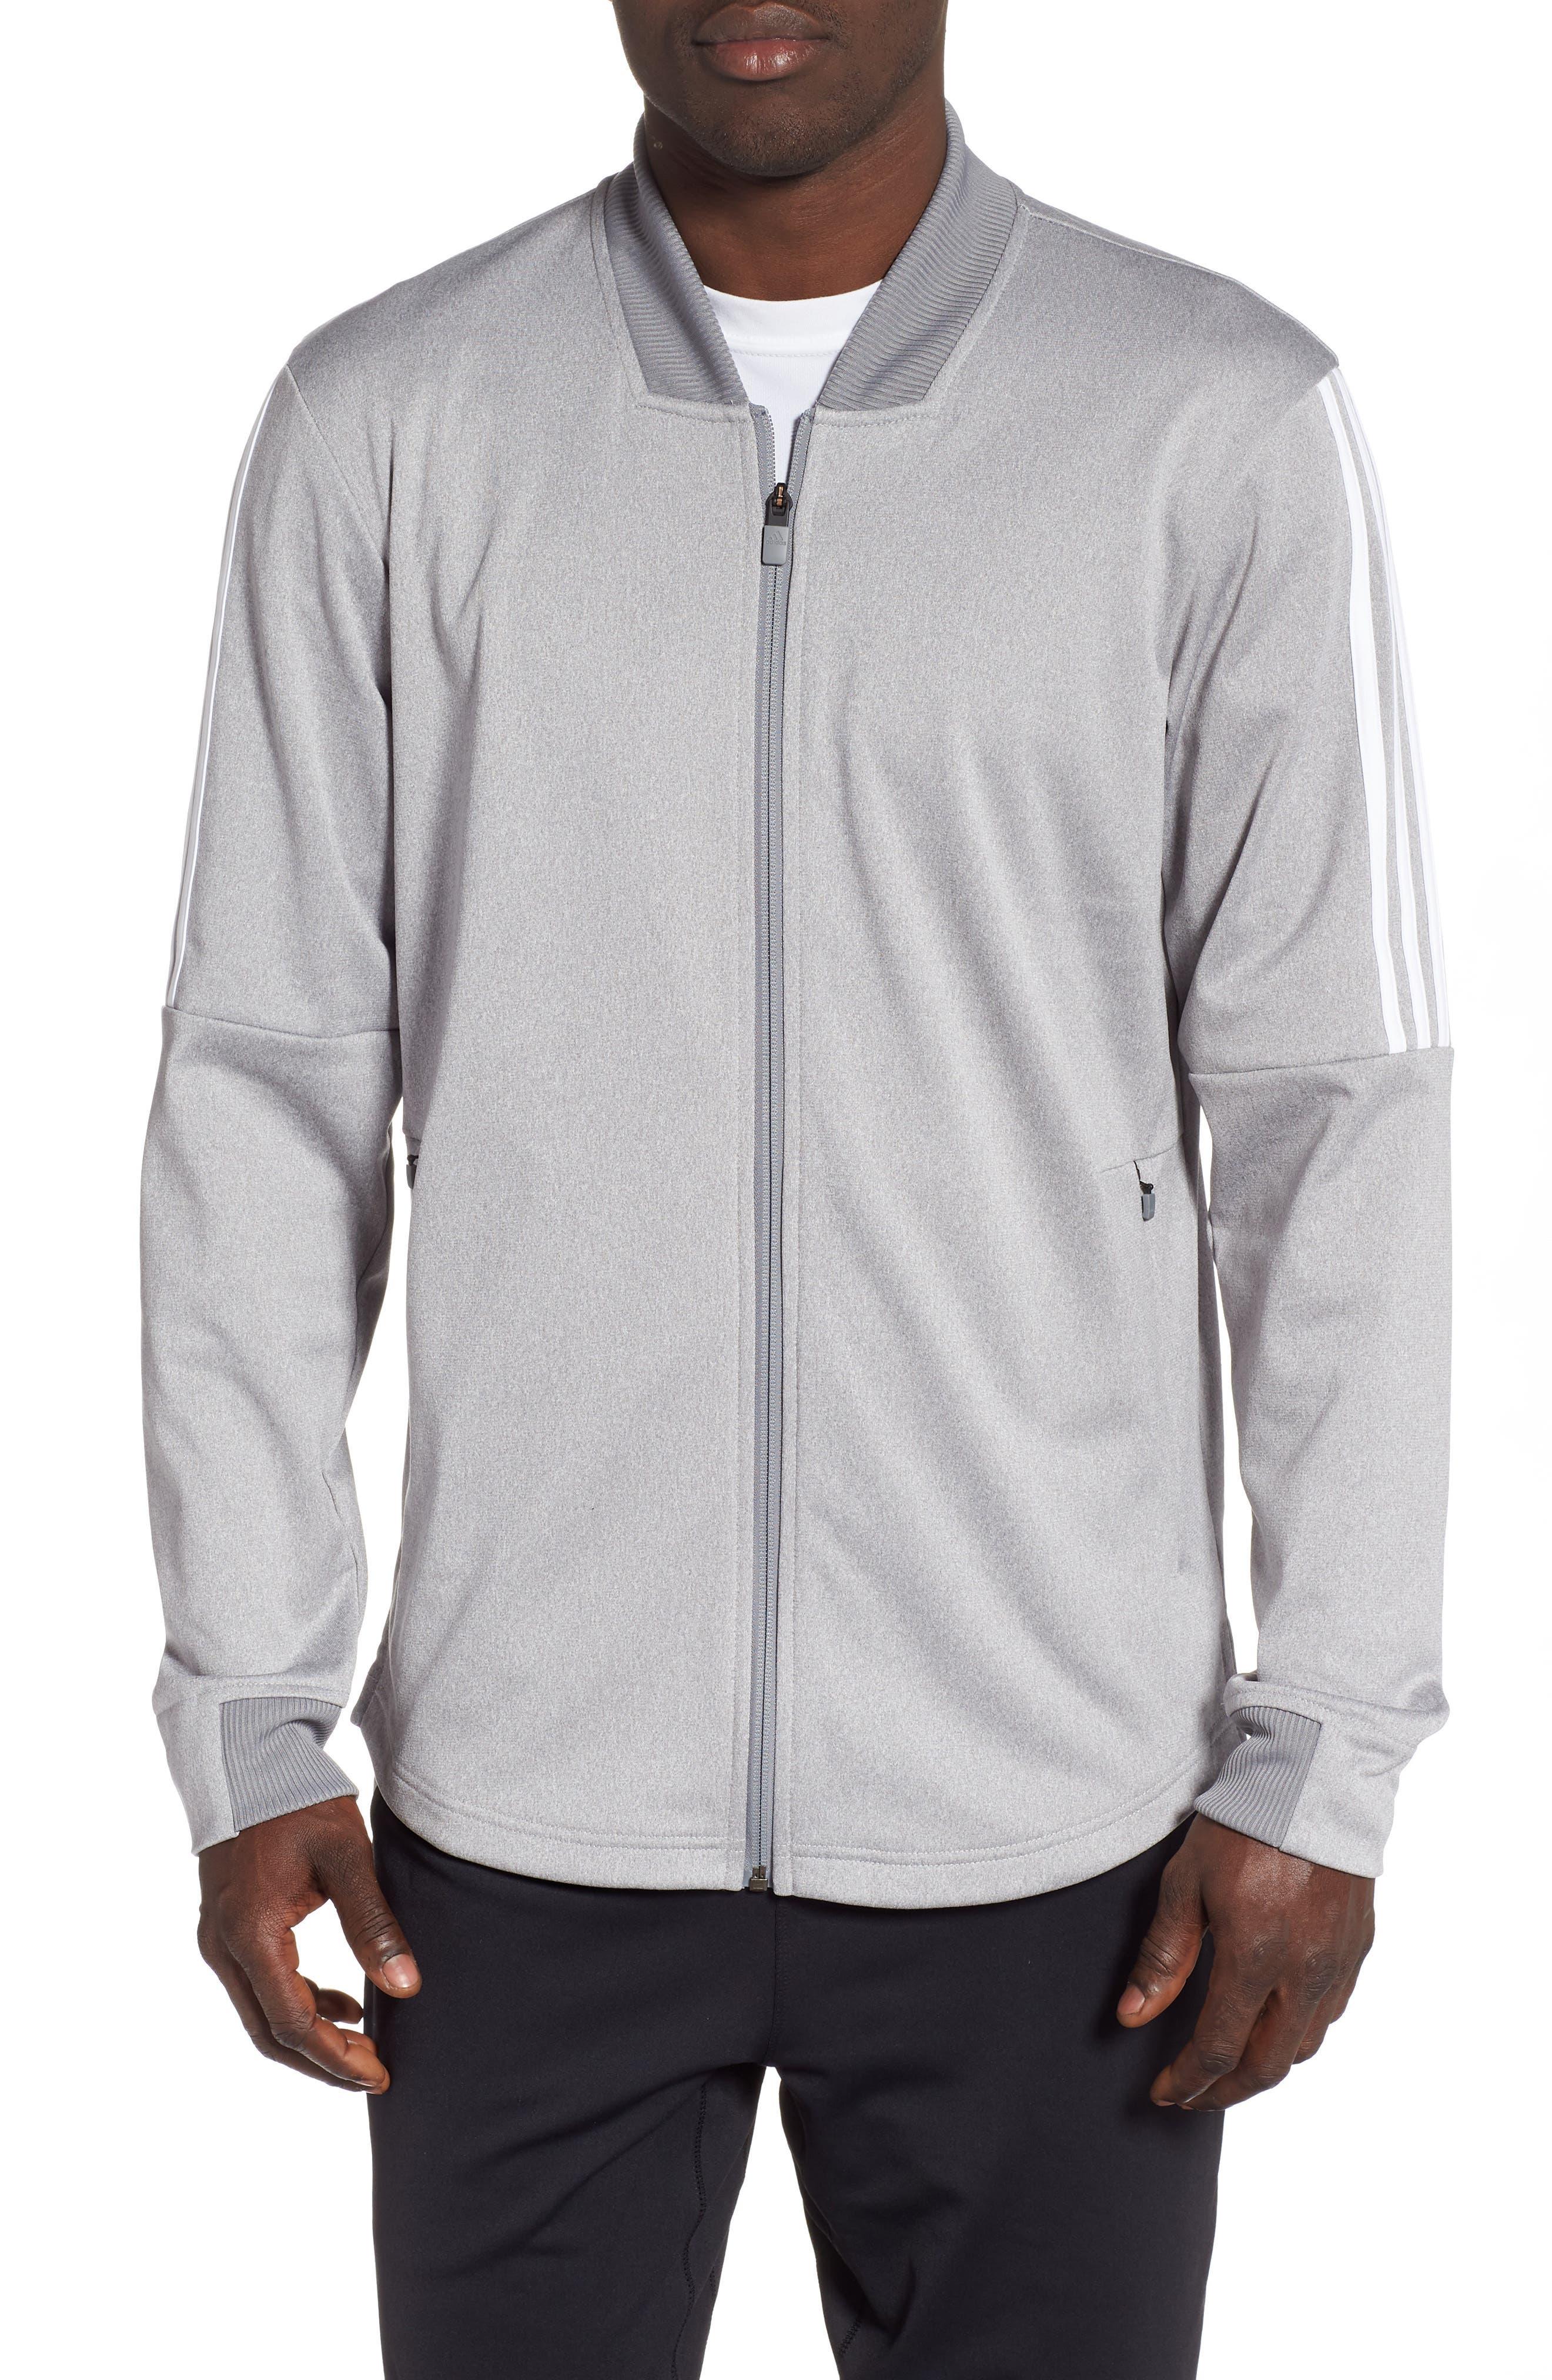 10a21c95b195 adidas jacket